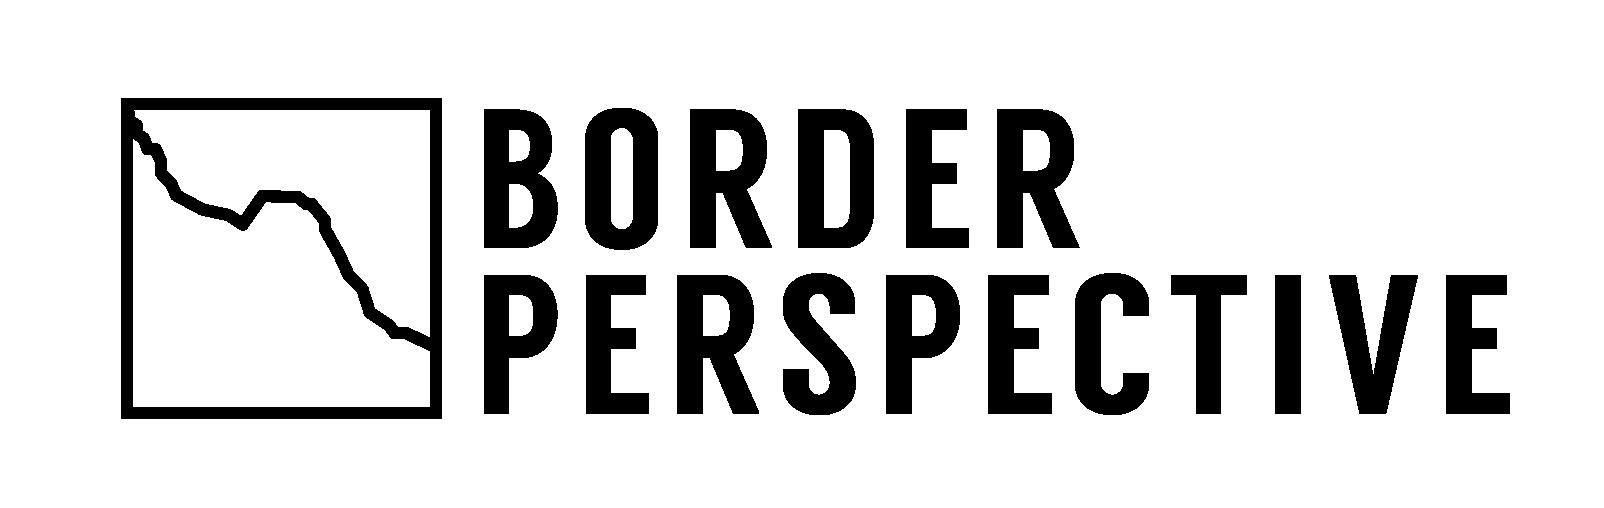 border perspective assets_Full Logo.png